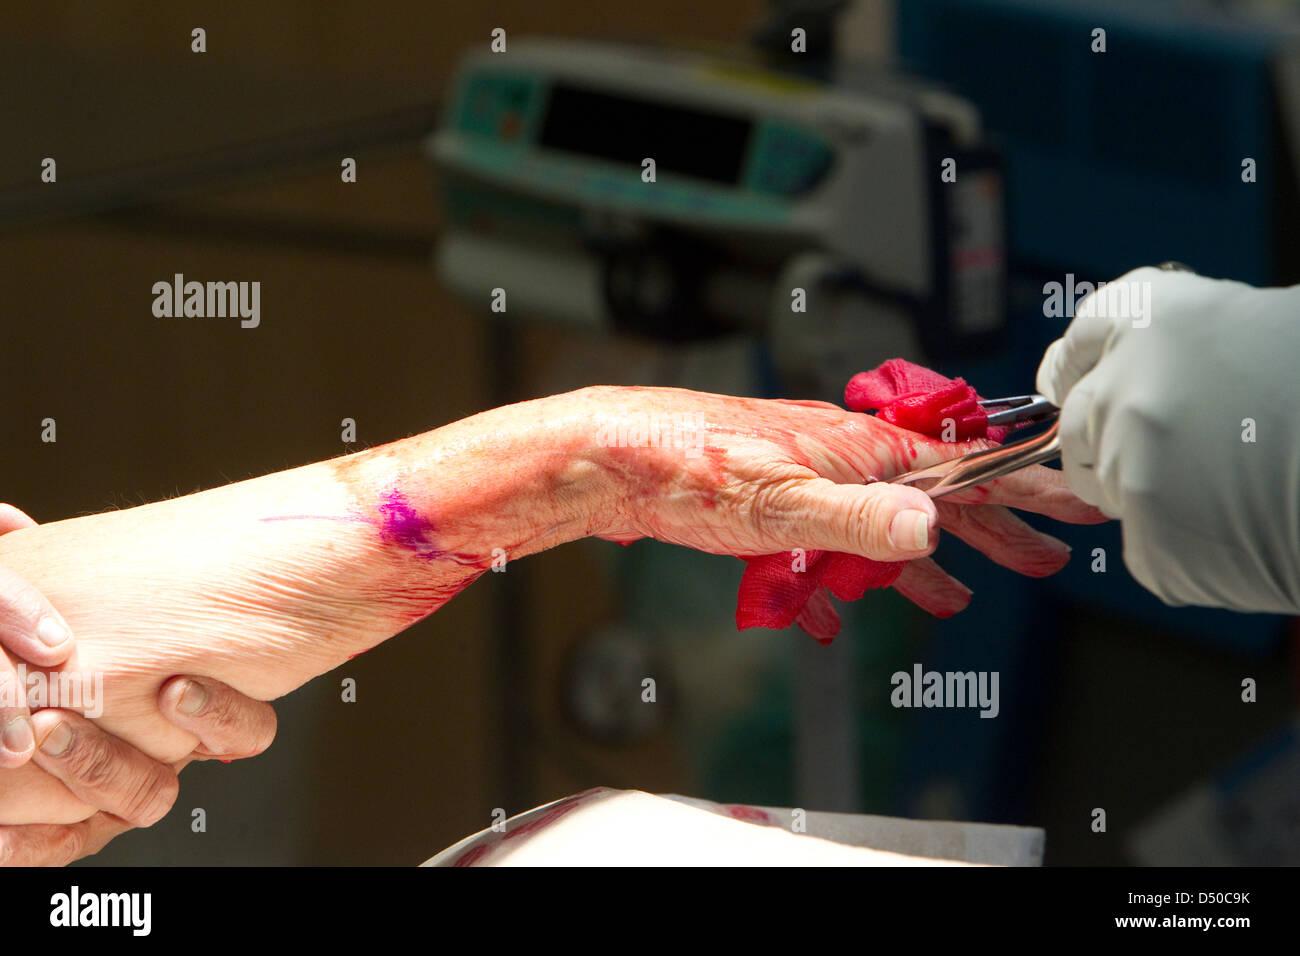 Hand operation - Stock Image